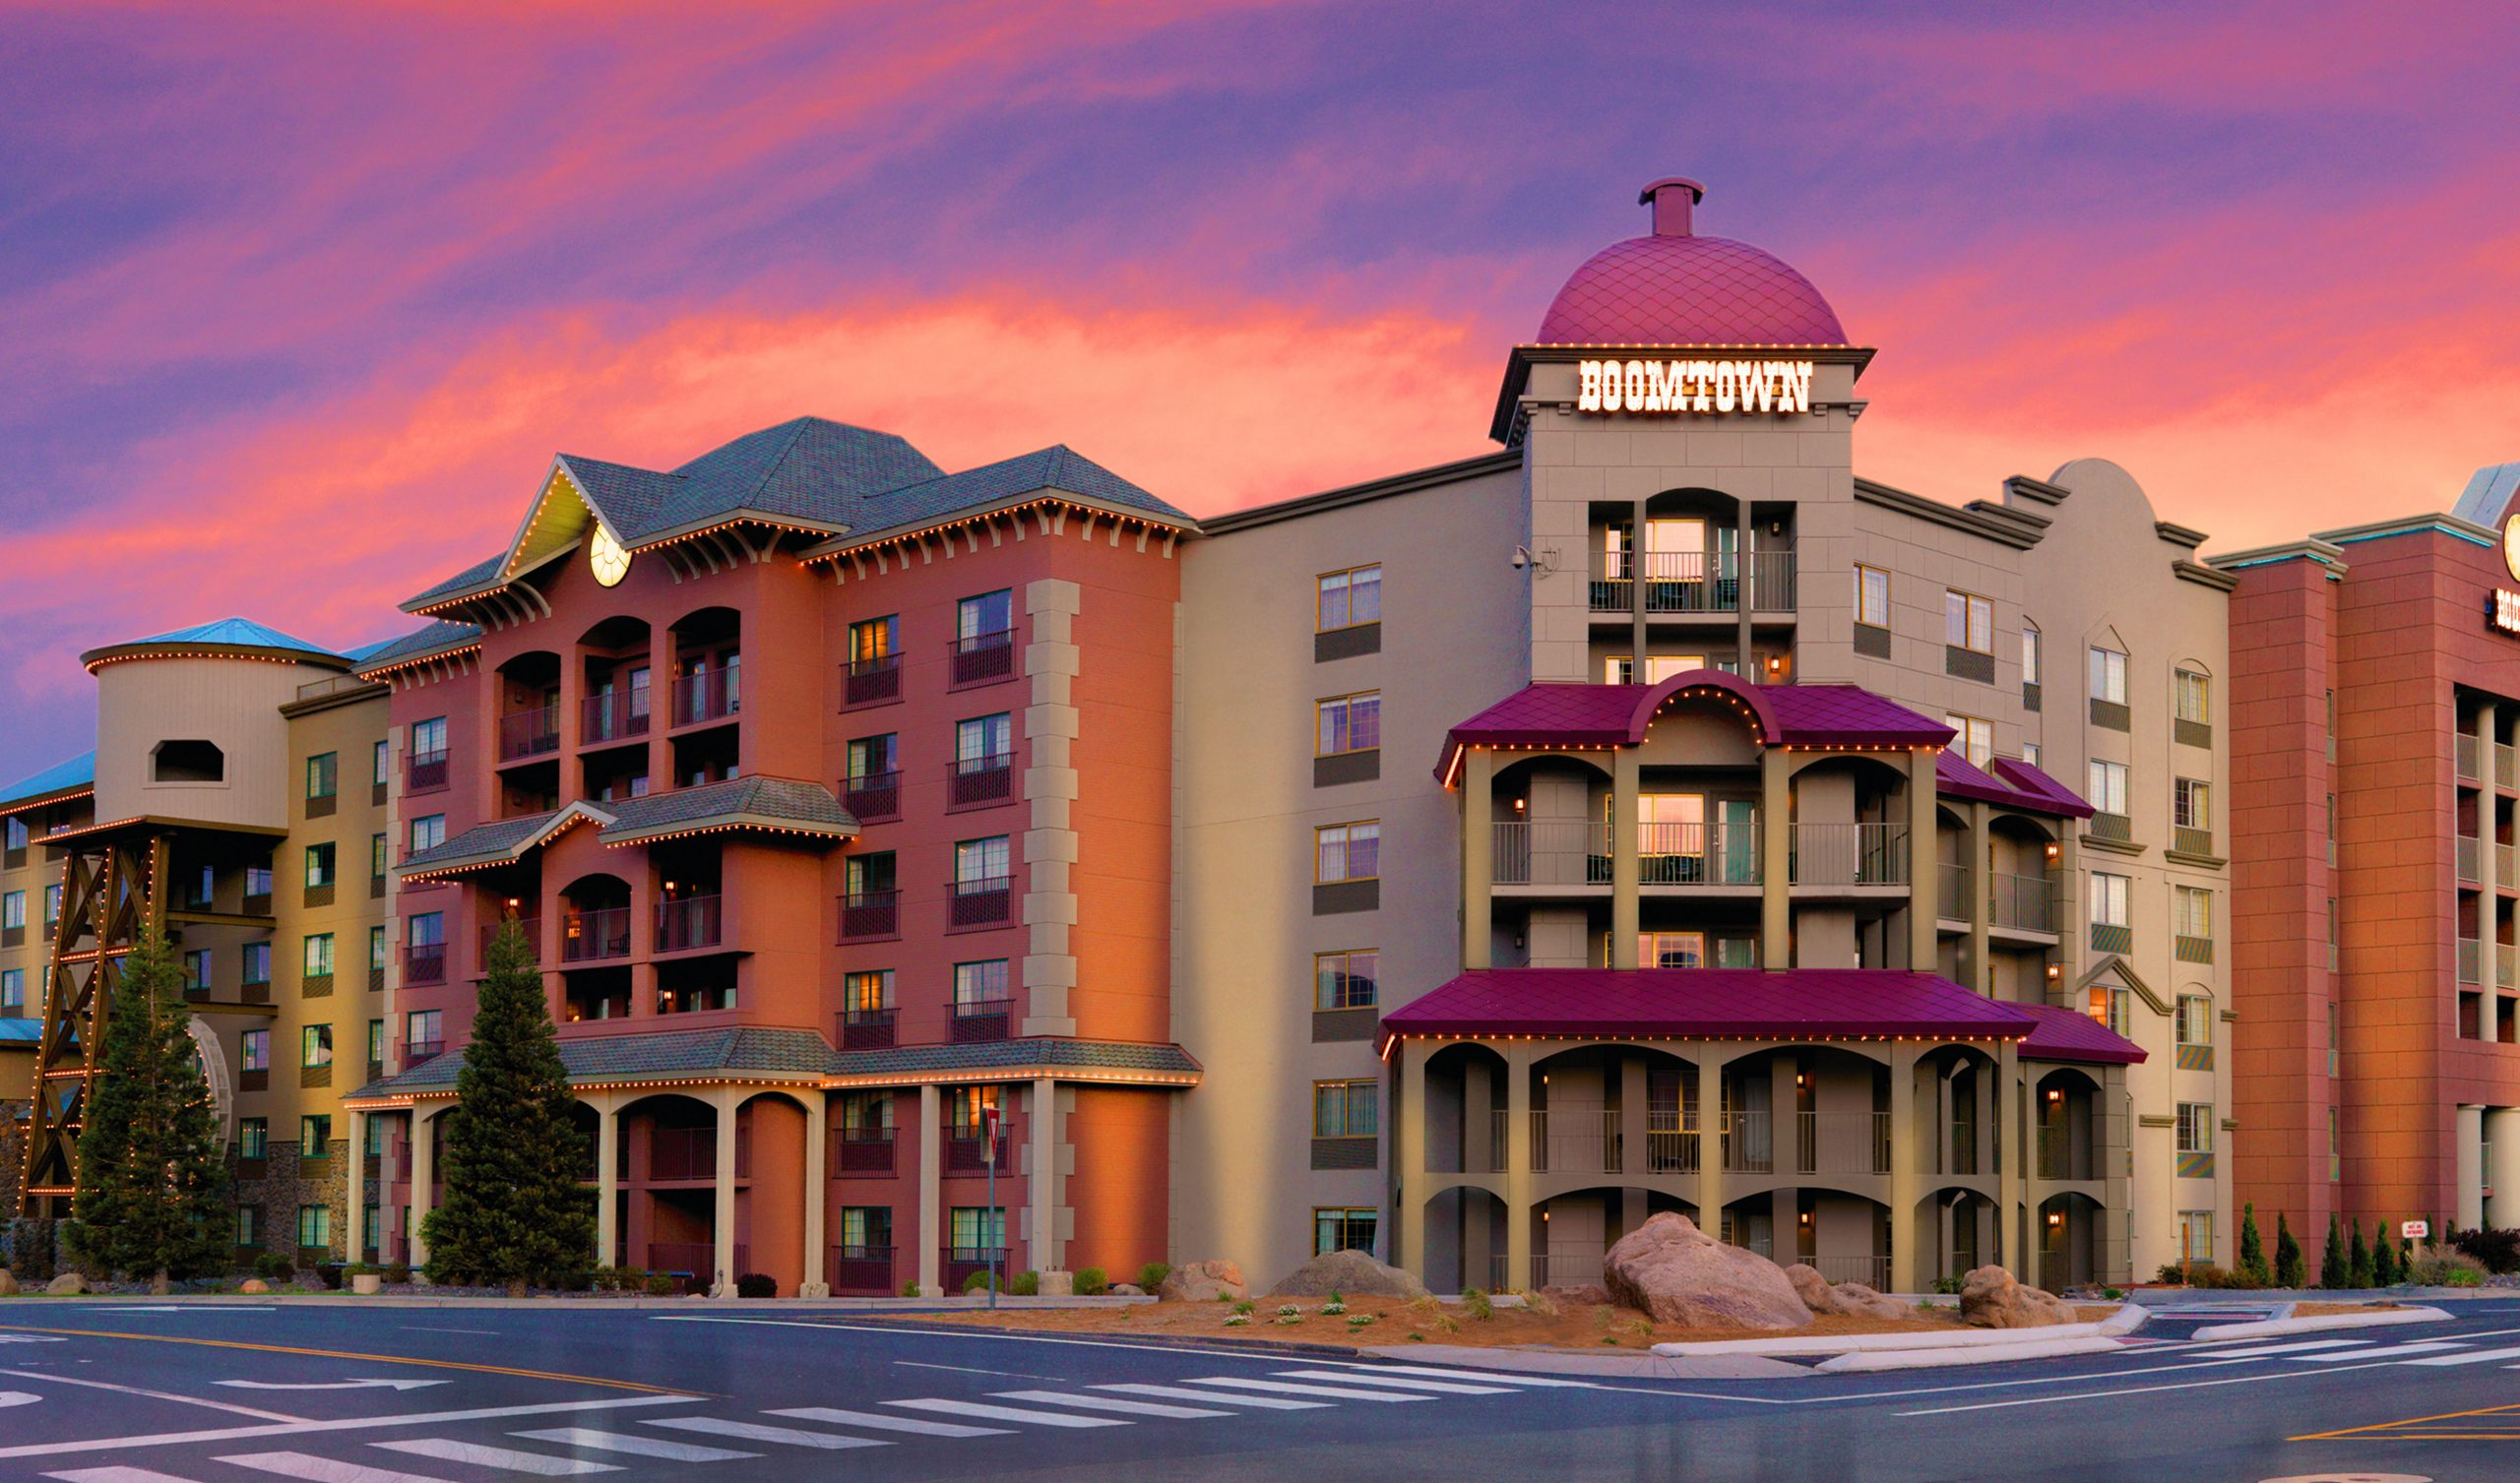 Boomtown hotel and casino verdi nv hotels near hardrock casino fort lauderdale